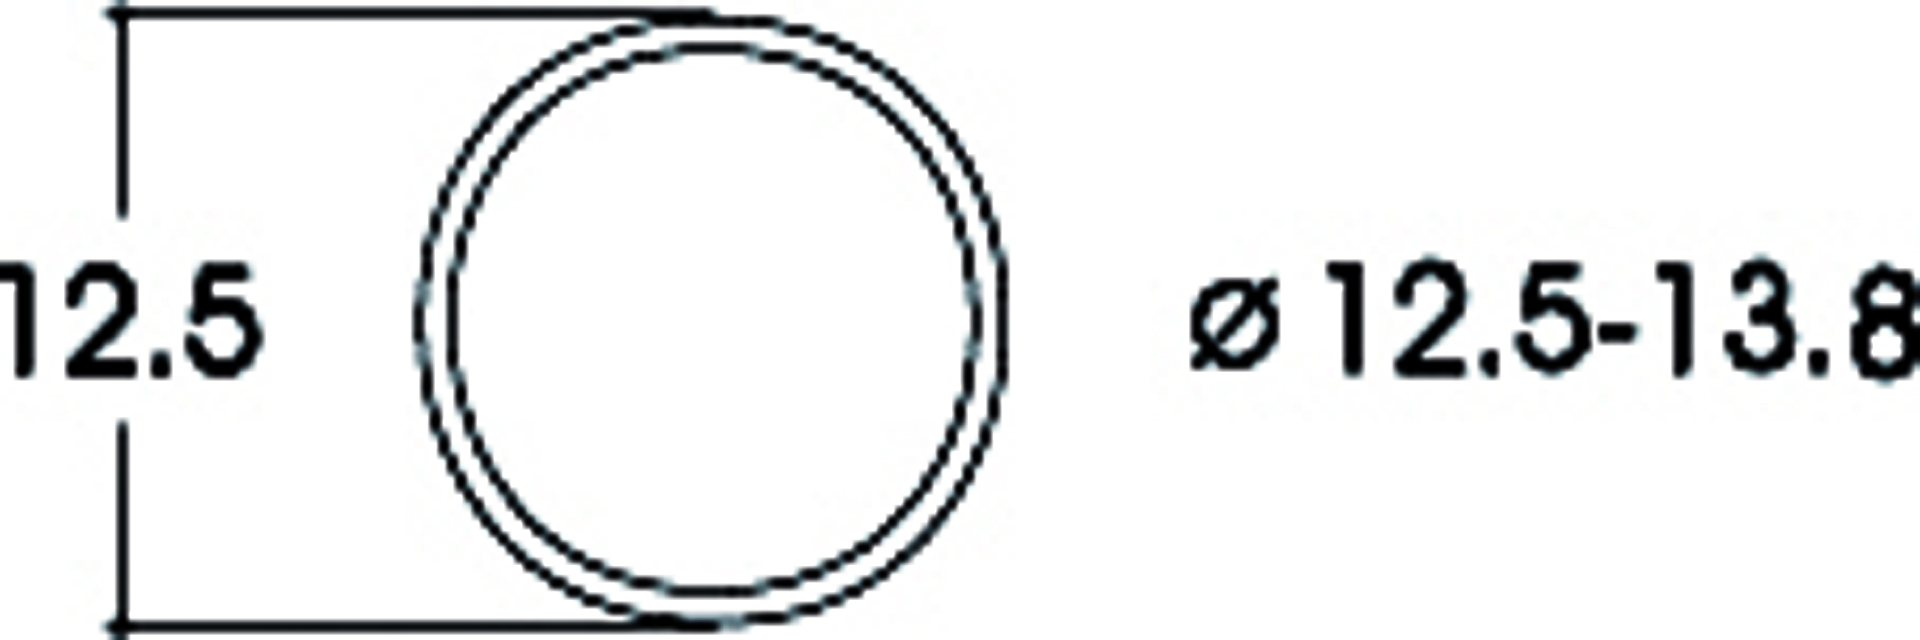 Roco 40066 Haftringsatz  12,5-13,8mm